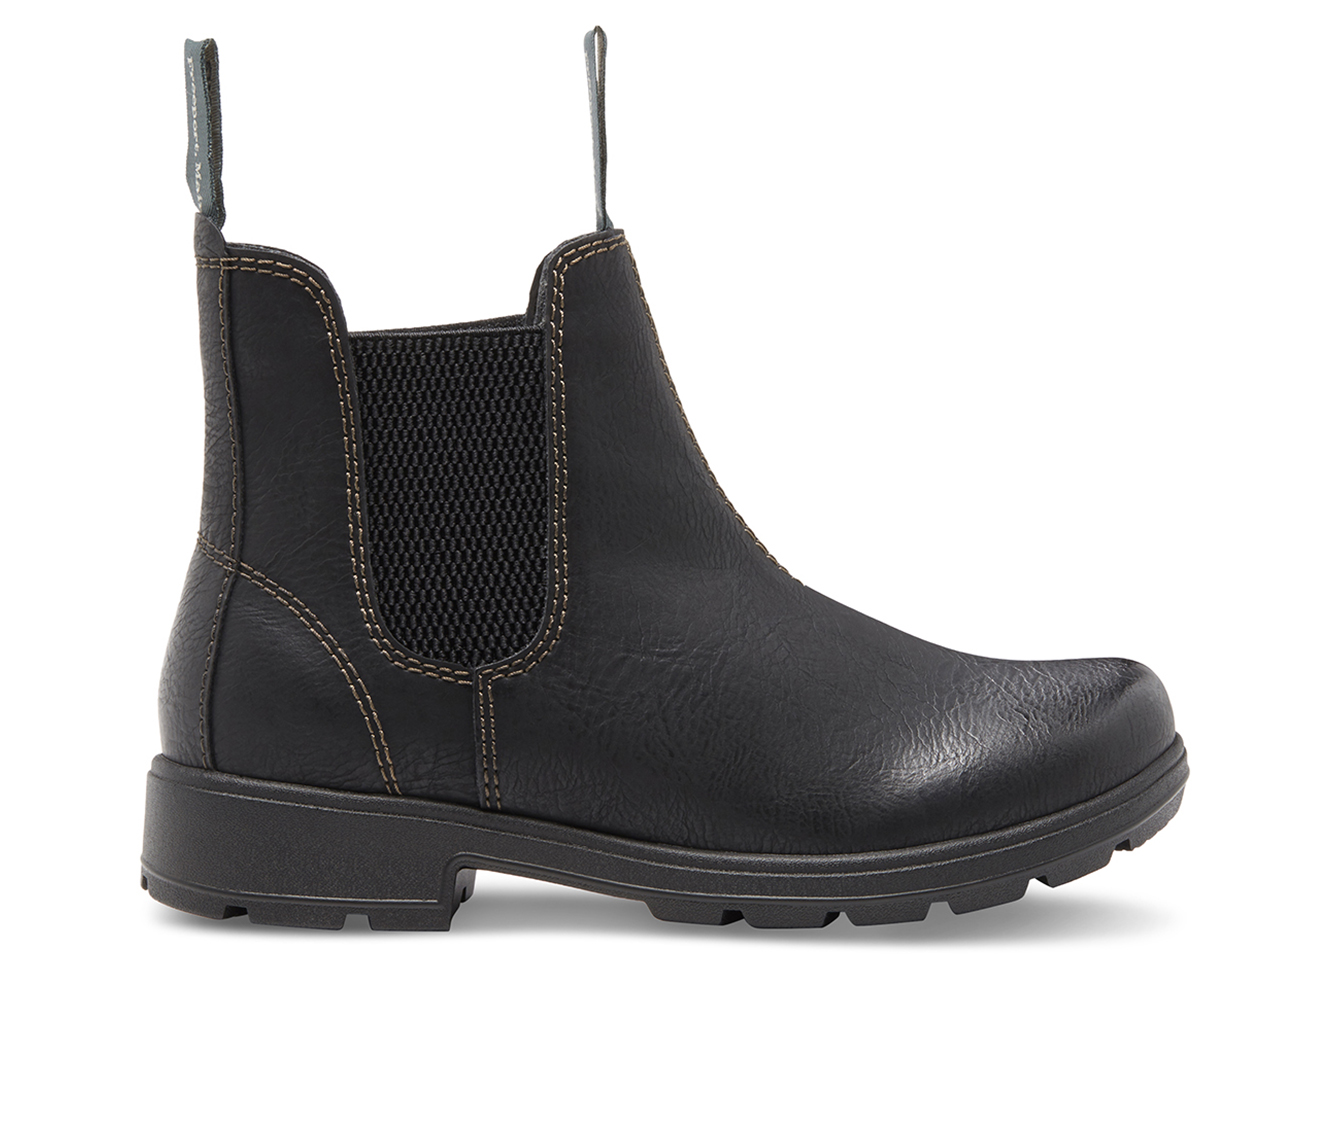 Eastland Baja Women's Boot (Black Leather)